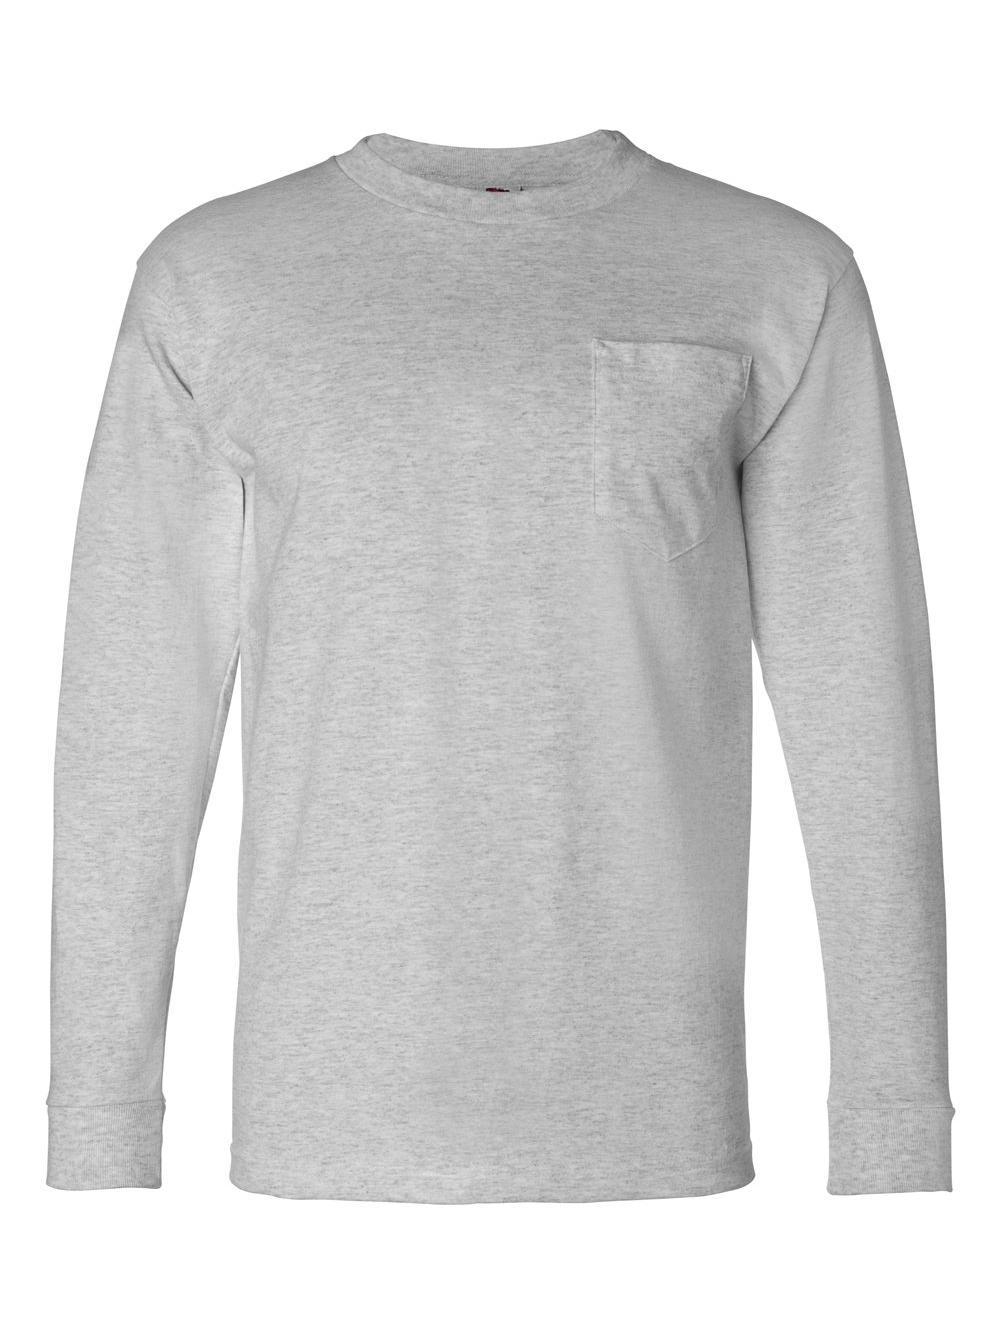 Bayside-USA-Made-Long-Sleeve-T-Shirt-with-a-Pocket-8100 thumbnail 9